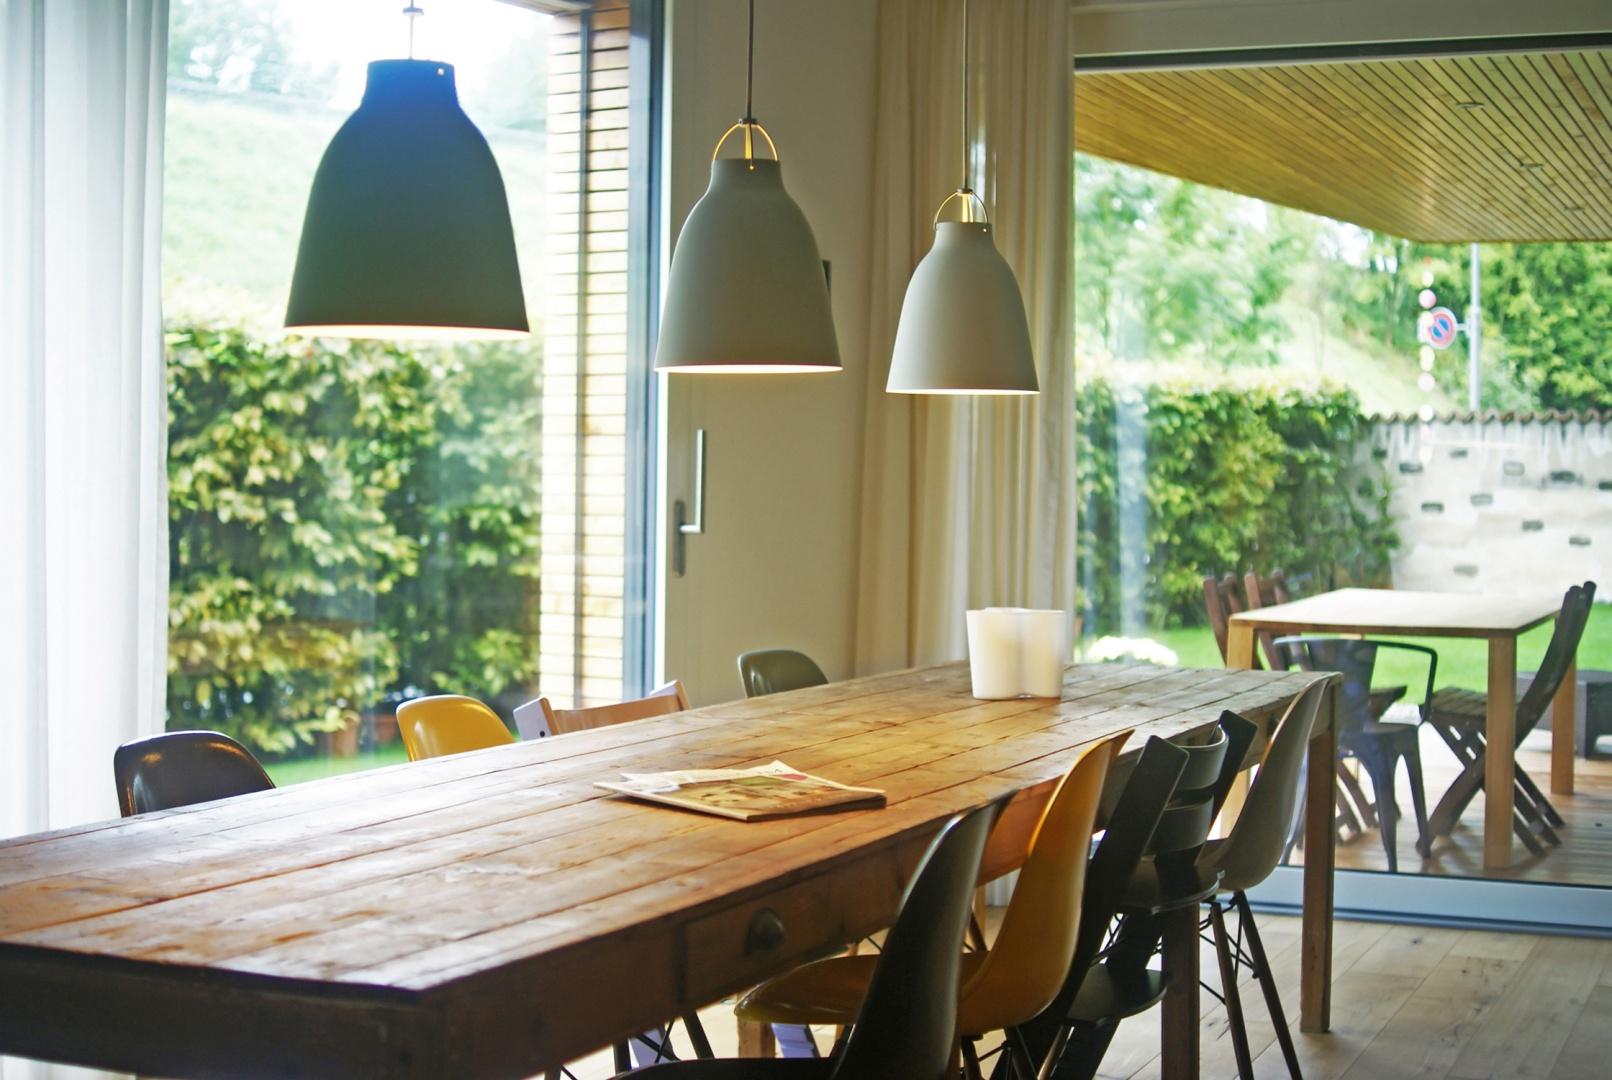 Einfamilienhaus stadt solothurn arc award for Pramierte einfamilienhauser